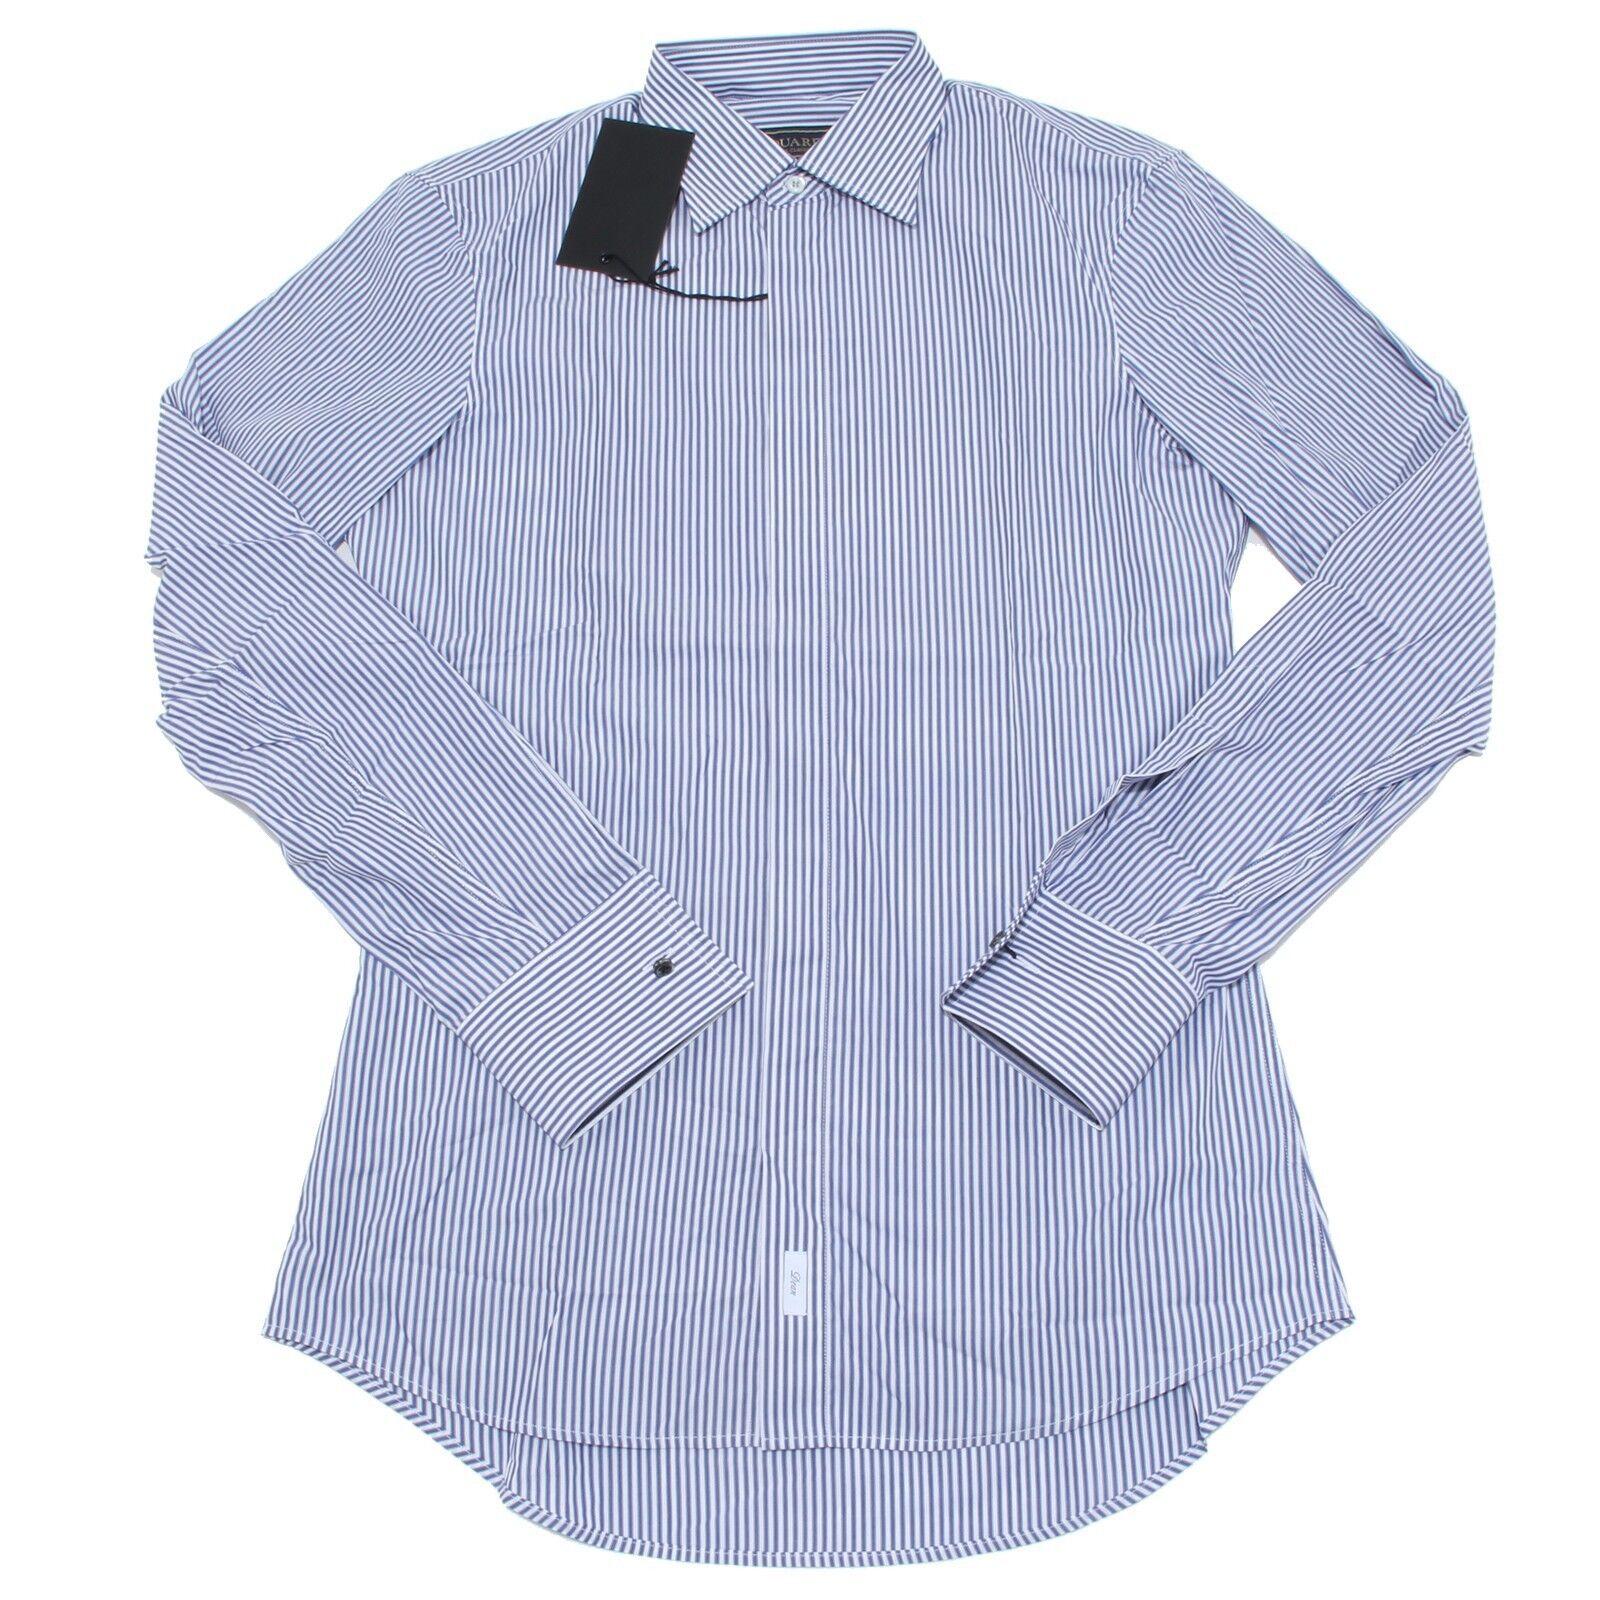 9619M camicia uomo DSQUARED shirt Uomo gessata bianco blu